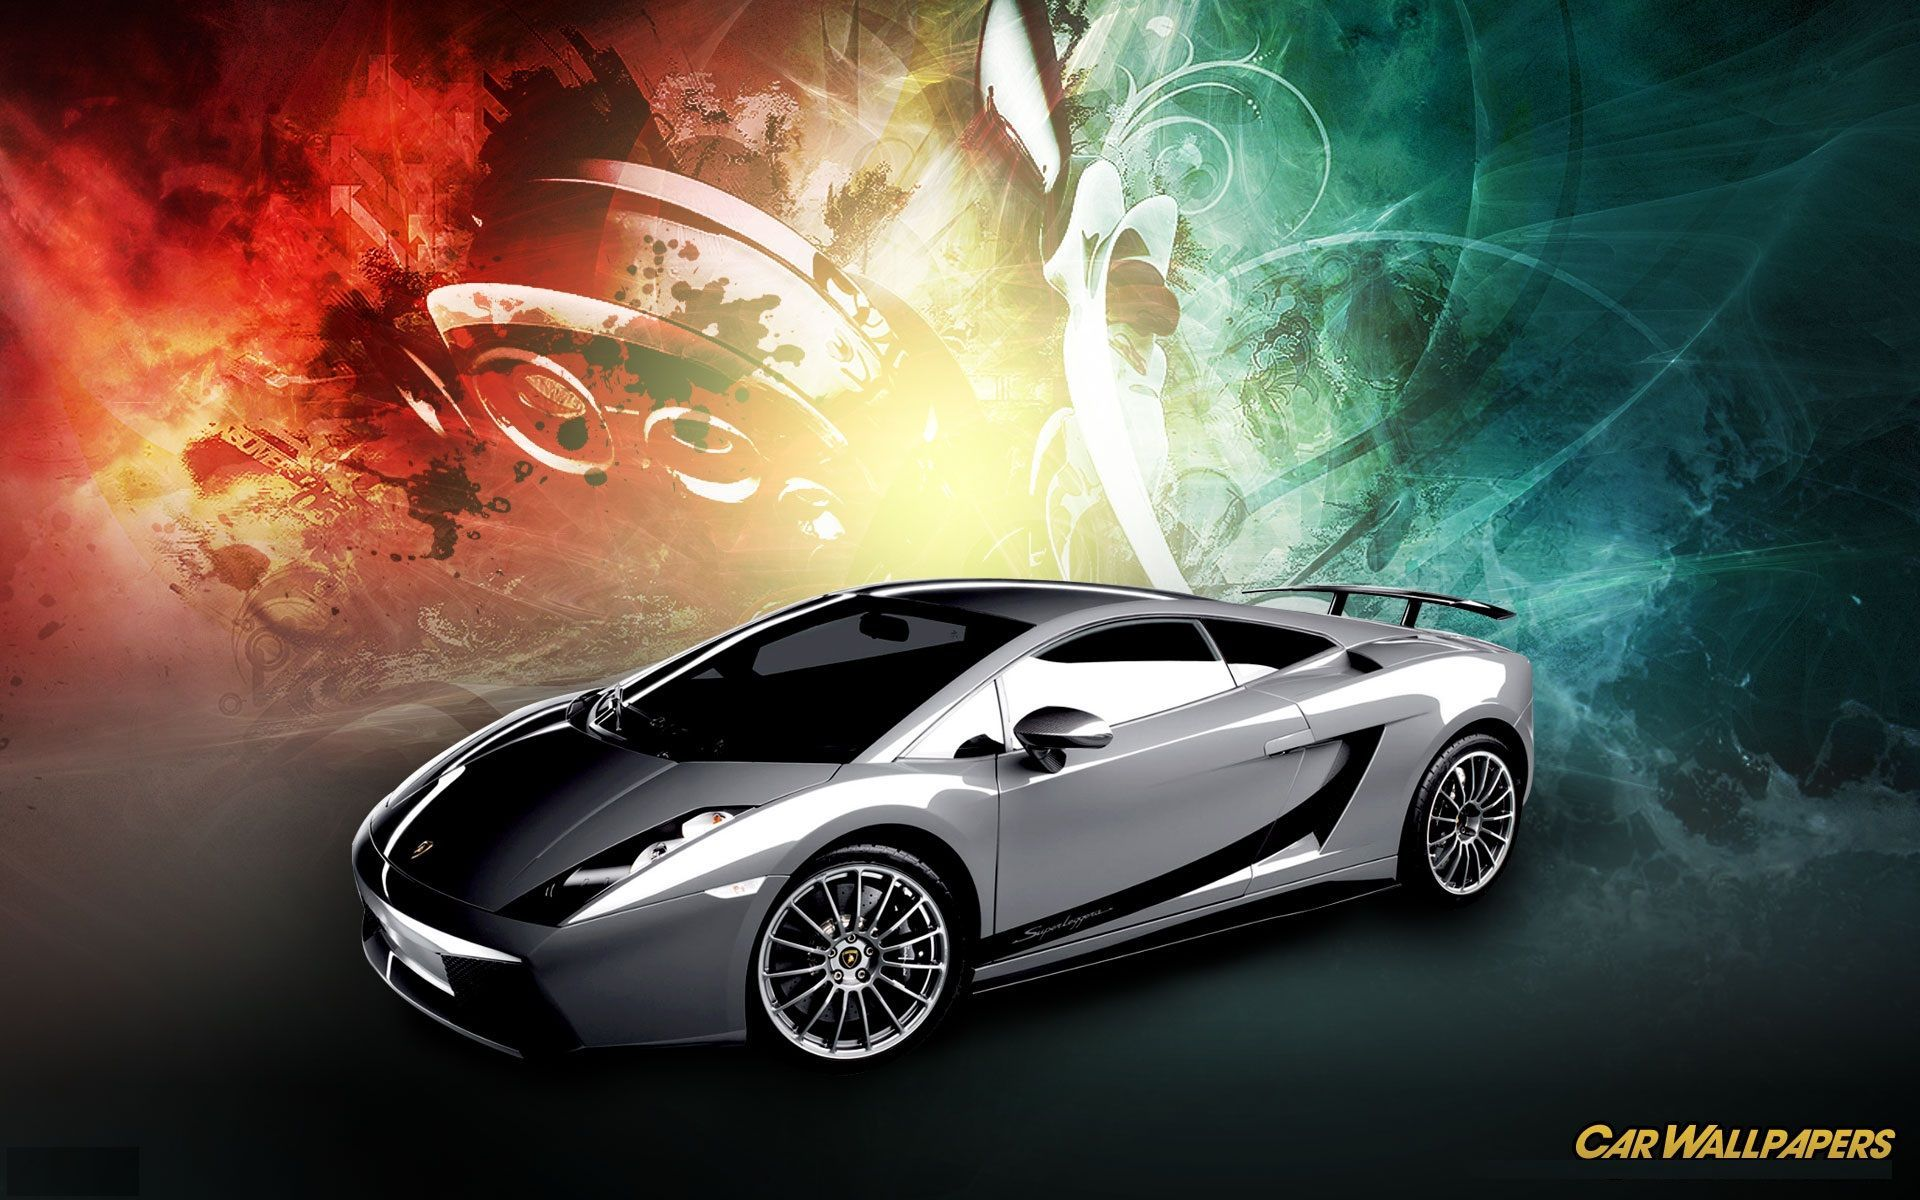 Silver Lamborghini Wallpapers Top Free Silver Lamborghini Backgrounds Wallpaperaccess